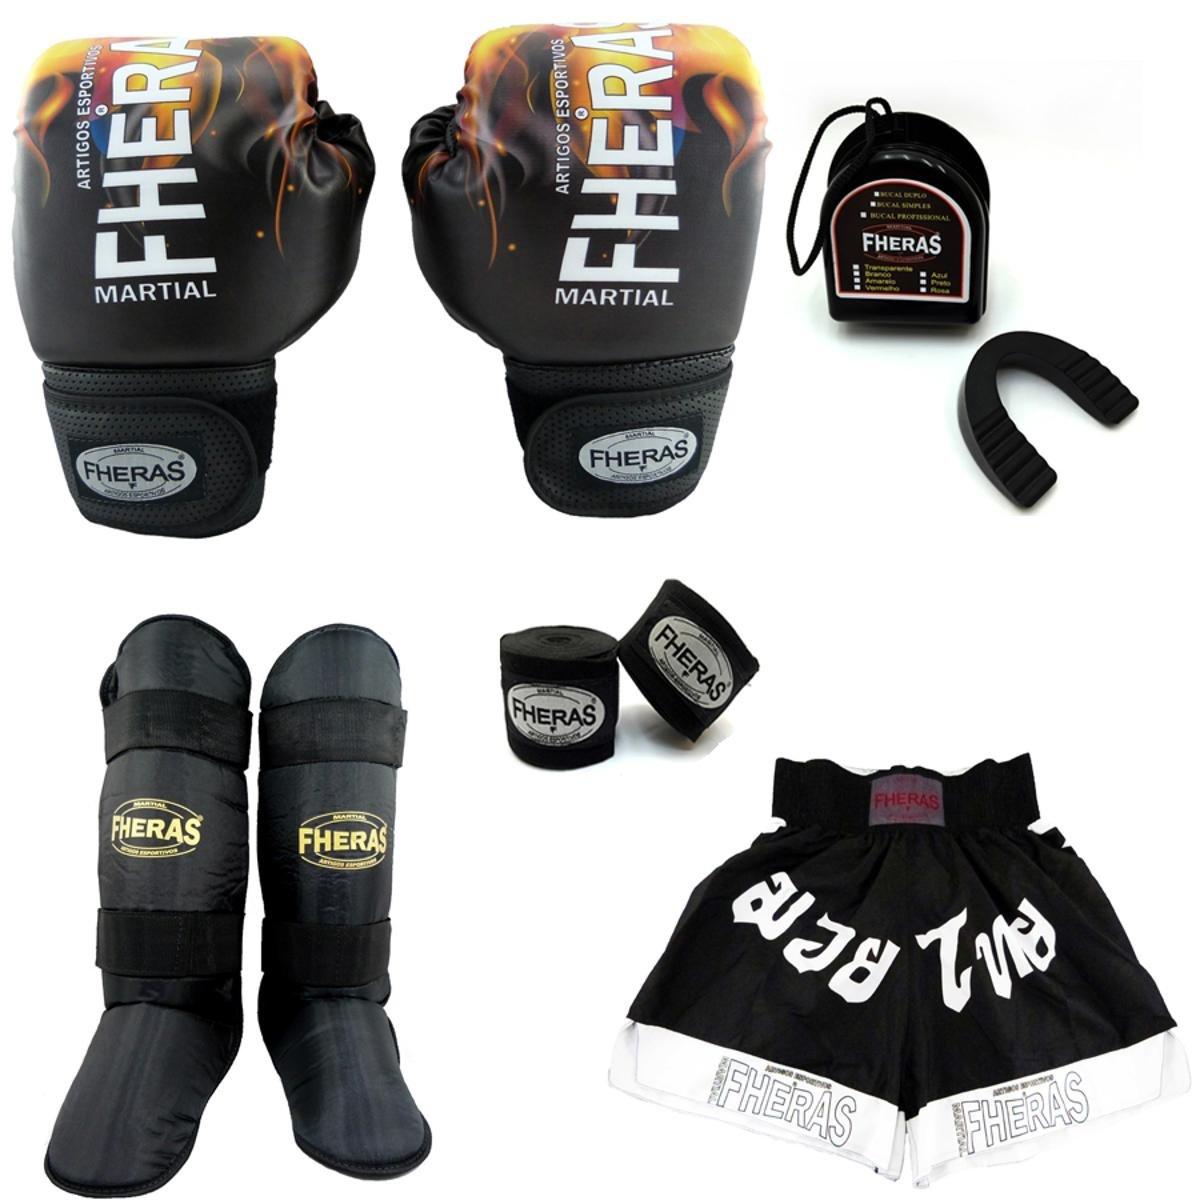 Kit Boxe Muay Thai Fheras Top Luva Bandagem Bucal Caneleira Shorts Fheras  12 OZ ... 332f12e336a13